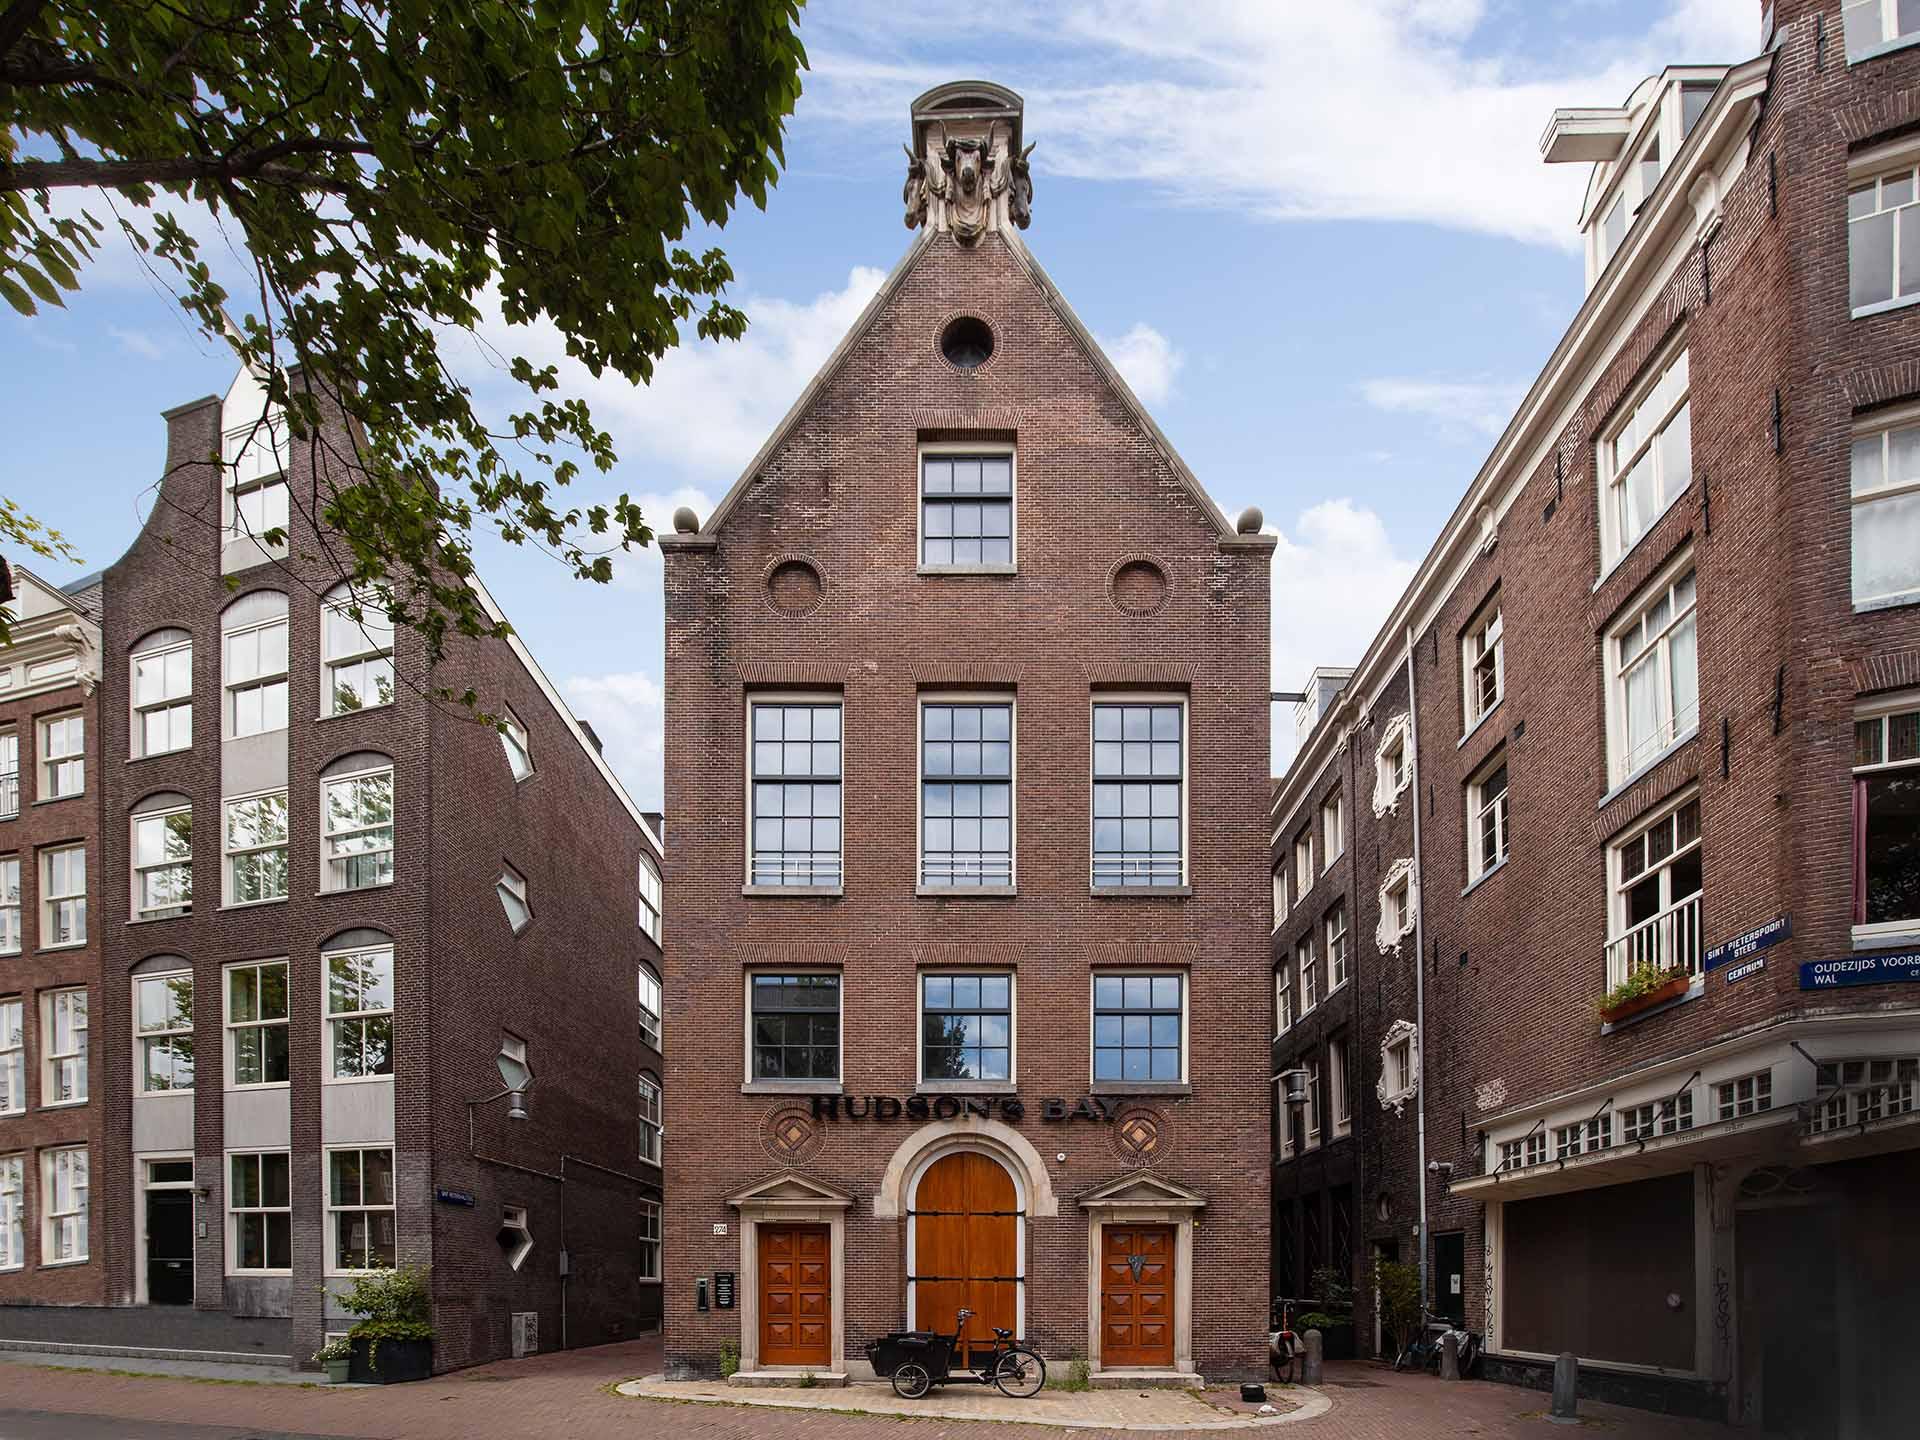 Vleeshal, Amsterdam Rokin, NL (2)